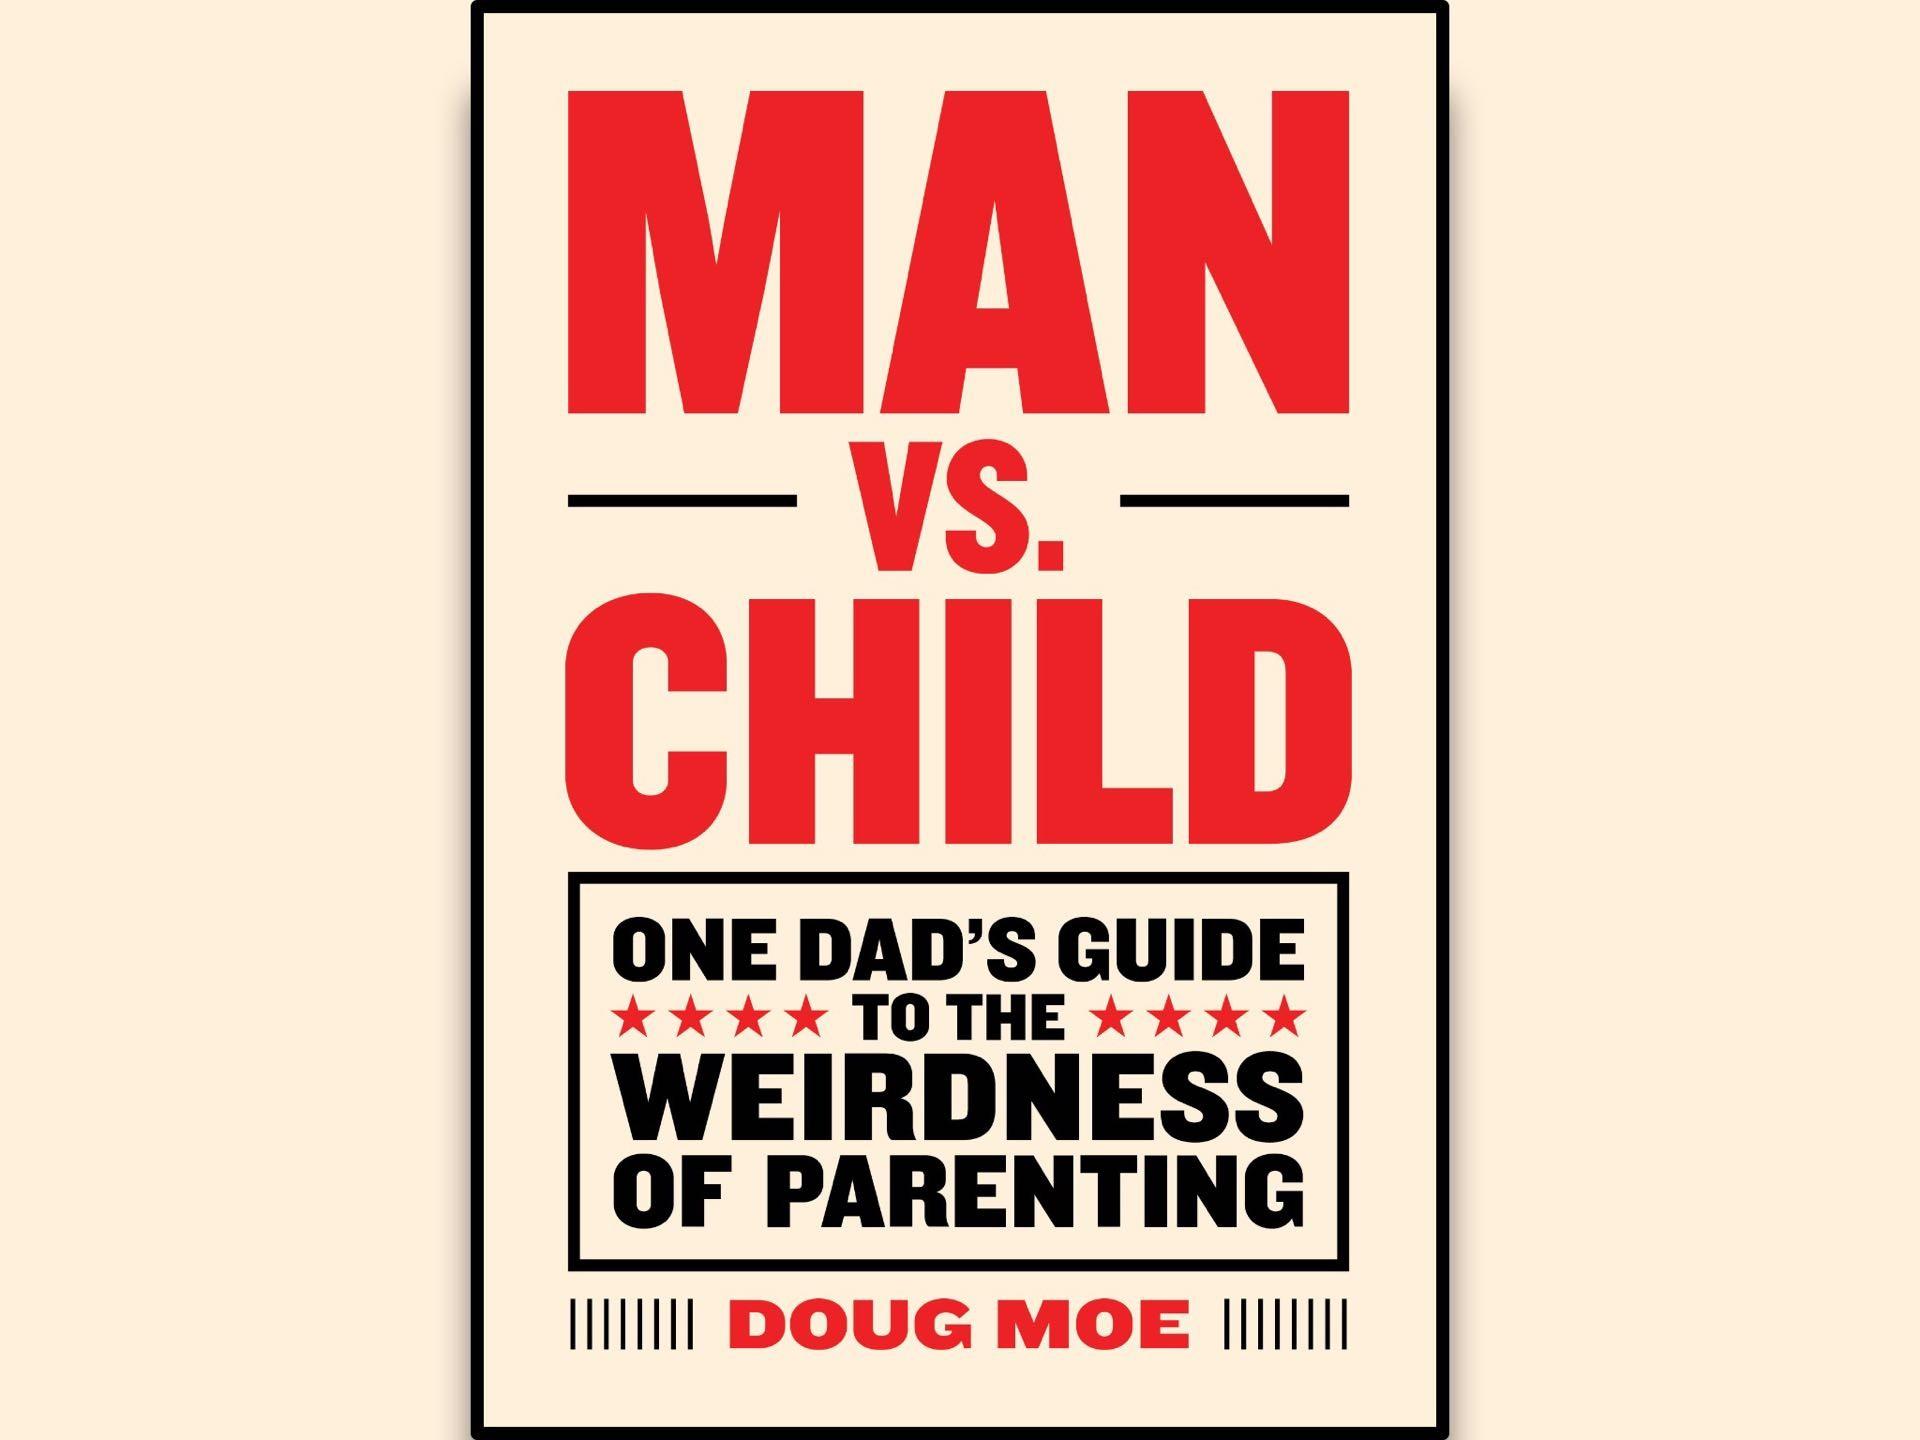 Man vs. Child by Doug Moe. ($14 hardcover)